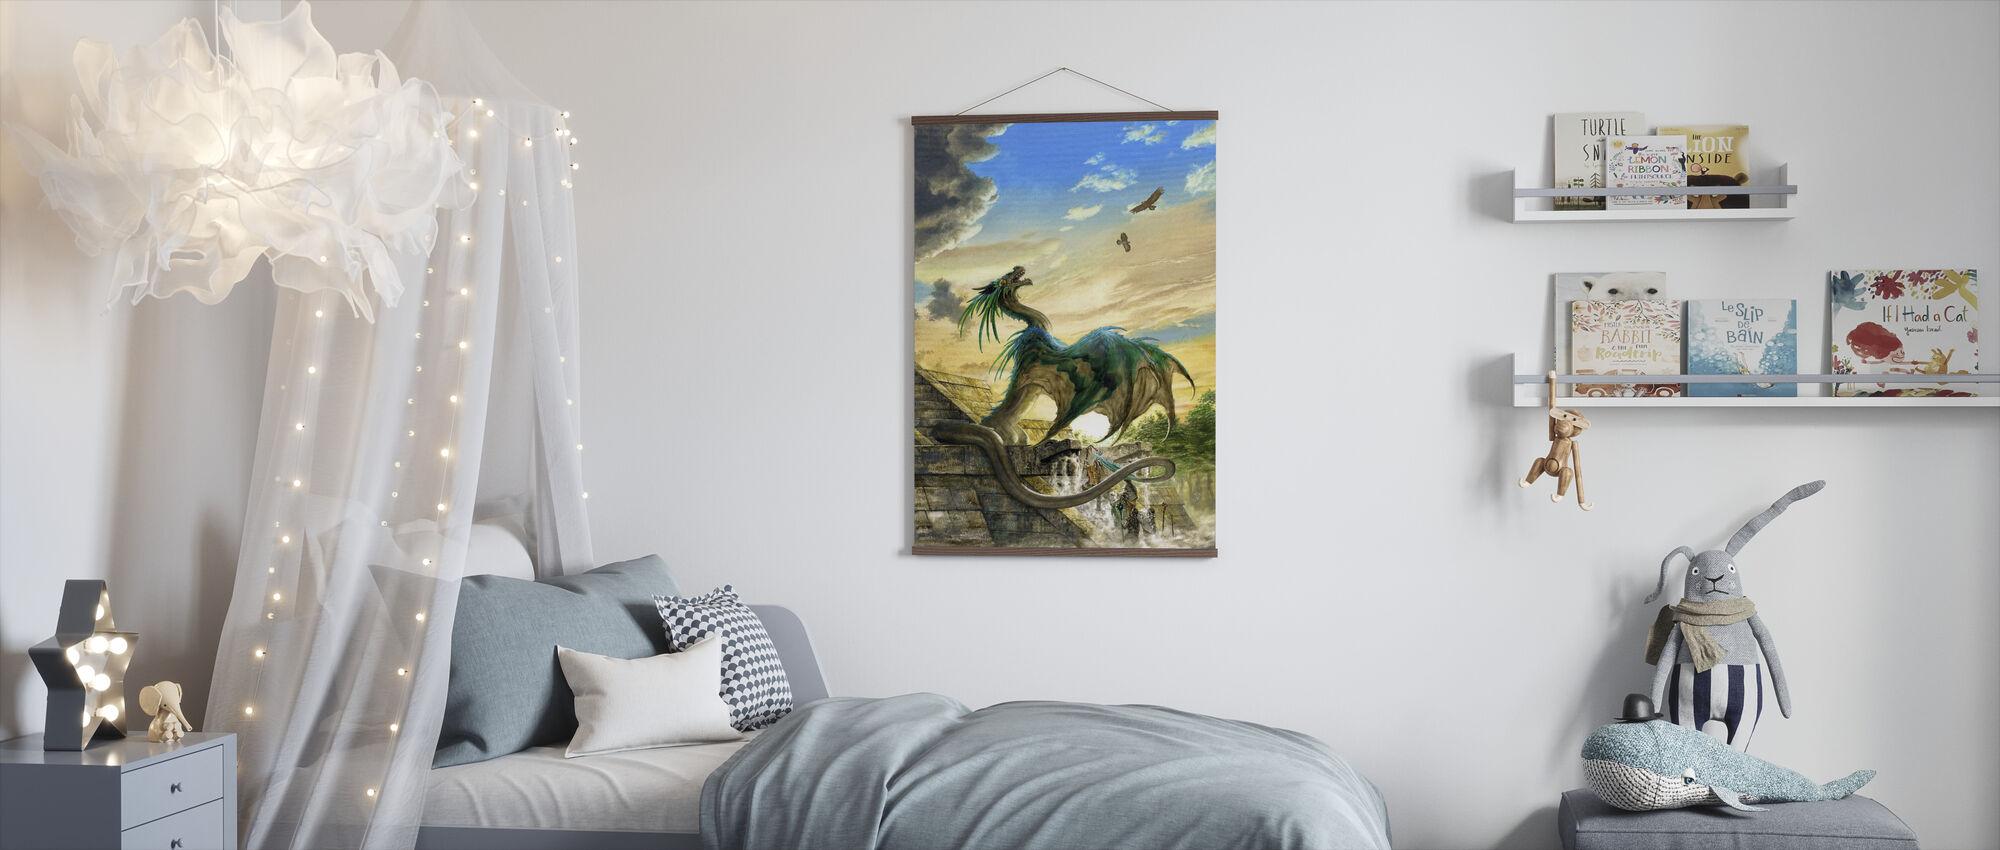 Quetzah - Poster - Kids Room